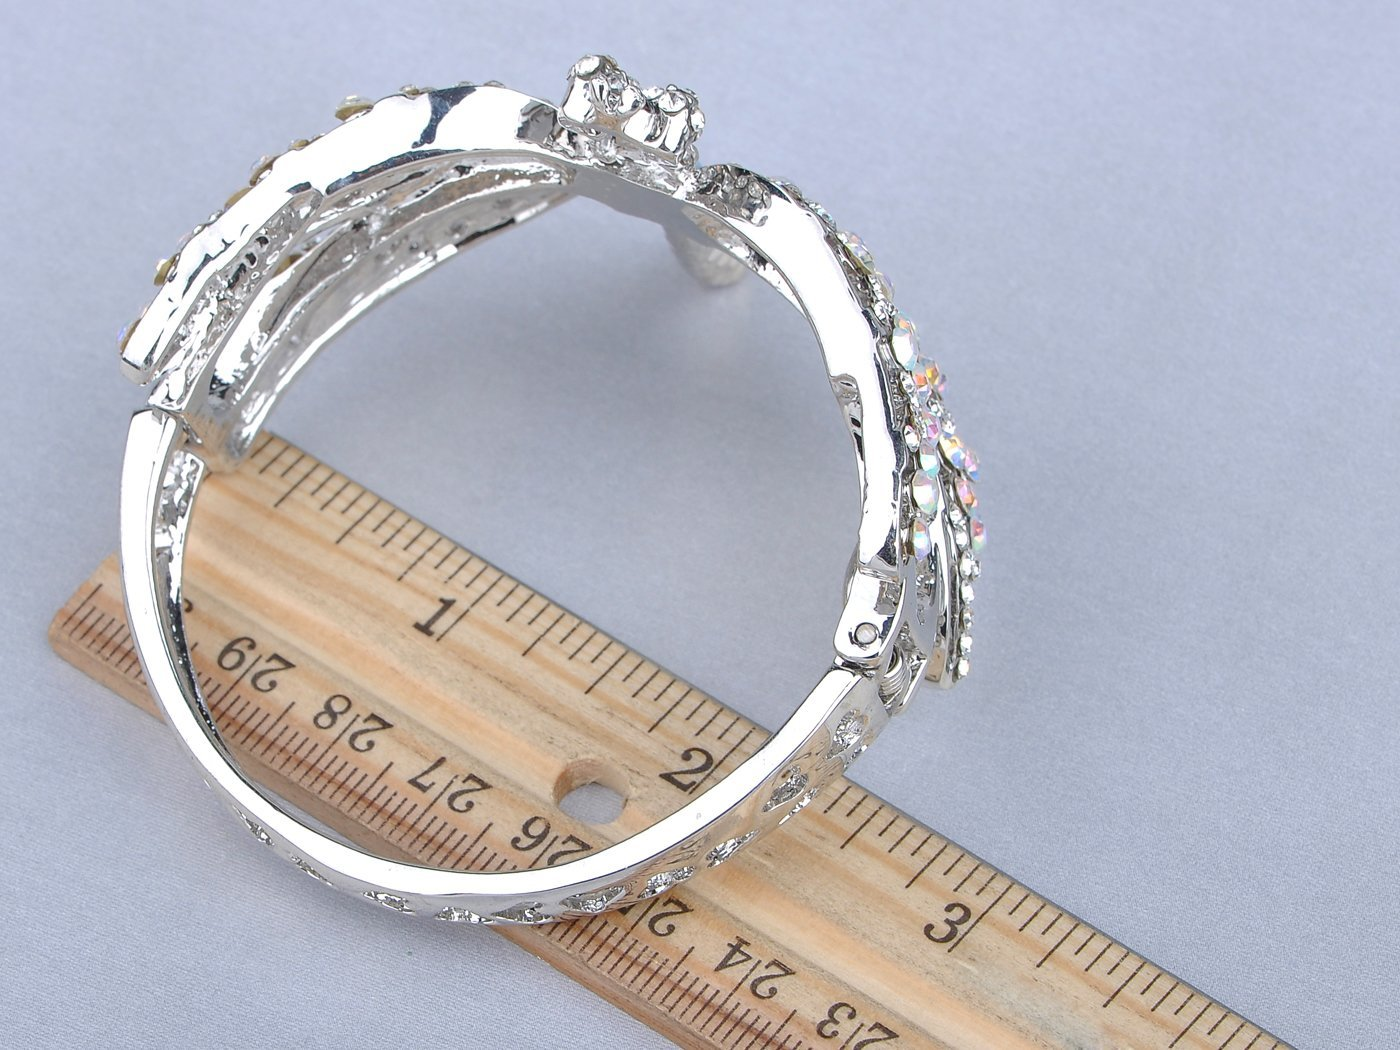 Alilang Womens Silvery Tone Clear Rhinestones Dragonfly Heart Cutout Bangle Bracelet by Alilang (Image #2)